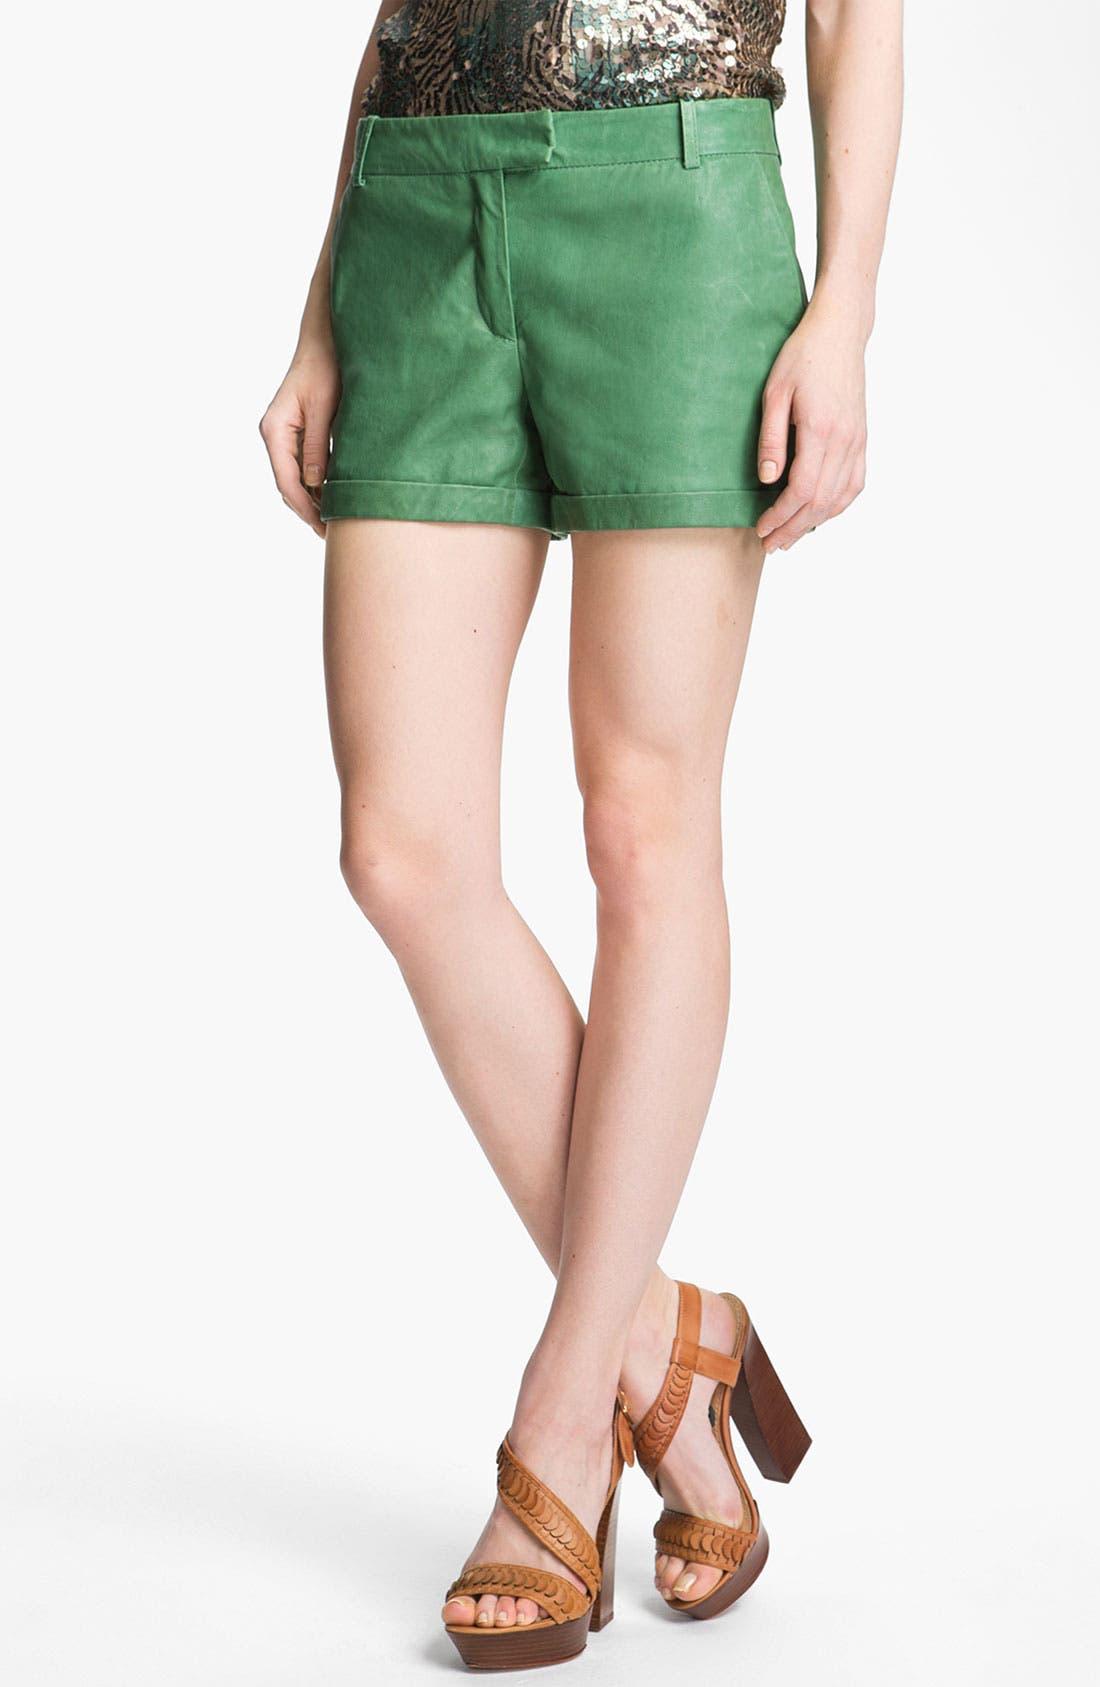 Alternate Image 1 Selected - Rachel Zoe 'Justin' Leather Shorts